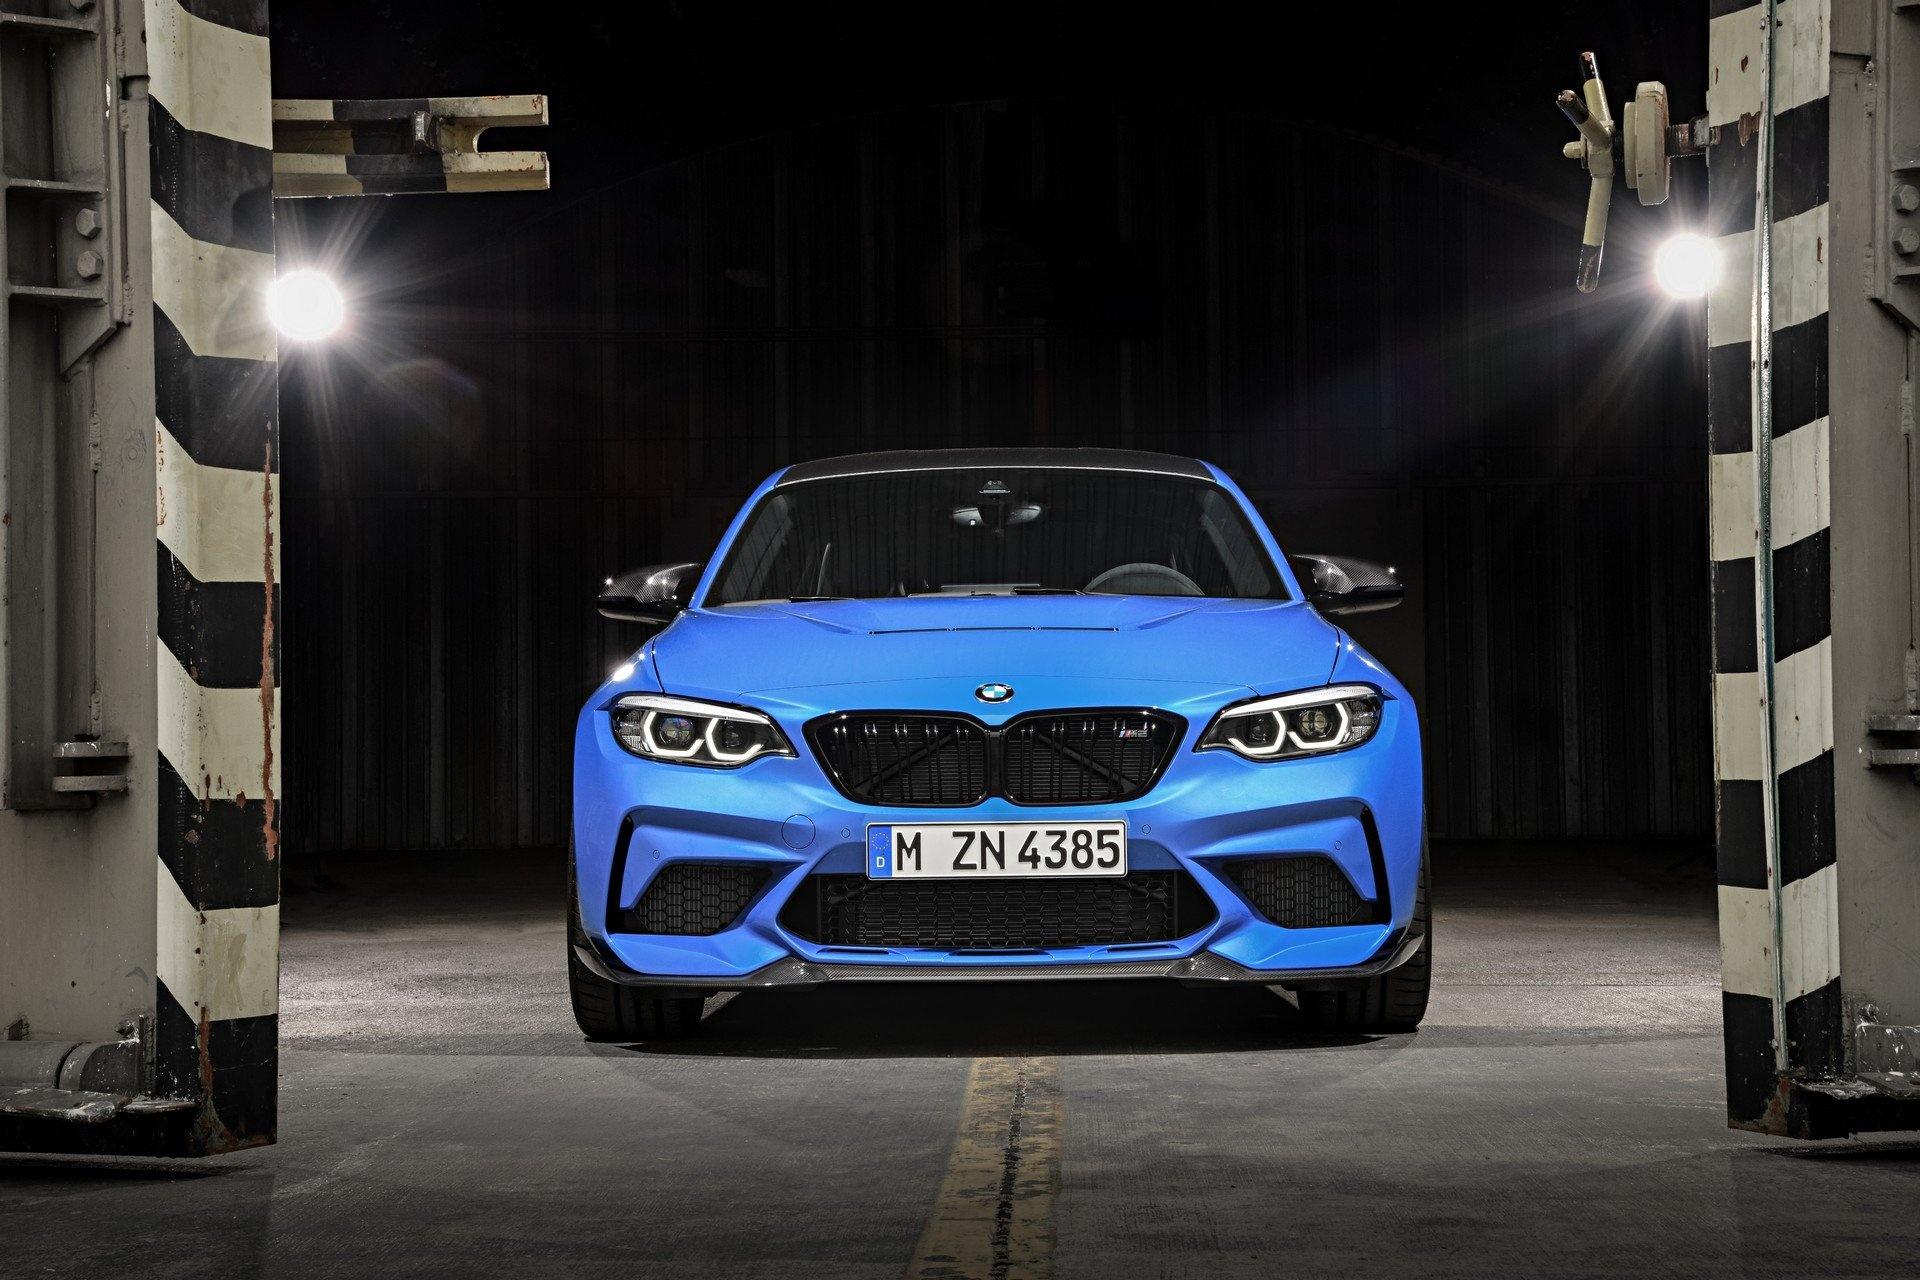 Chiem nguong BMW M2 C2 2020 anh 26